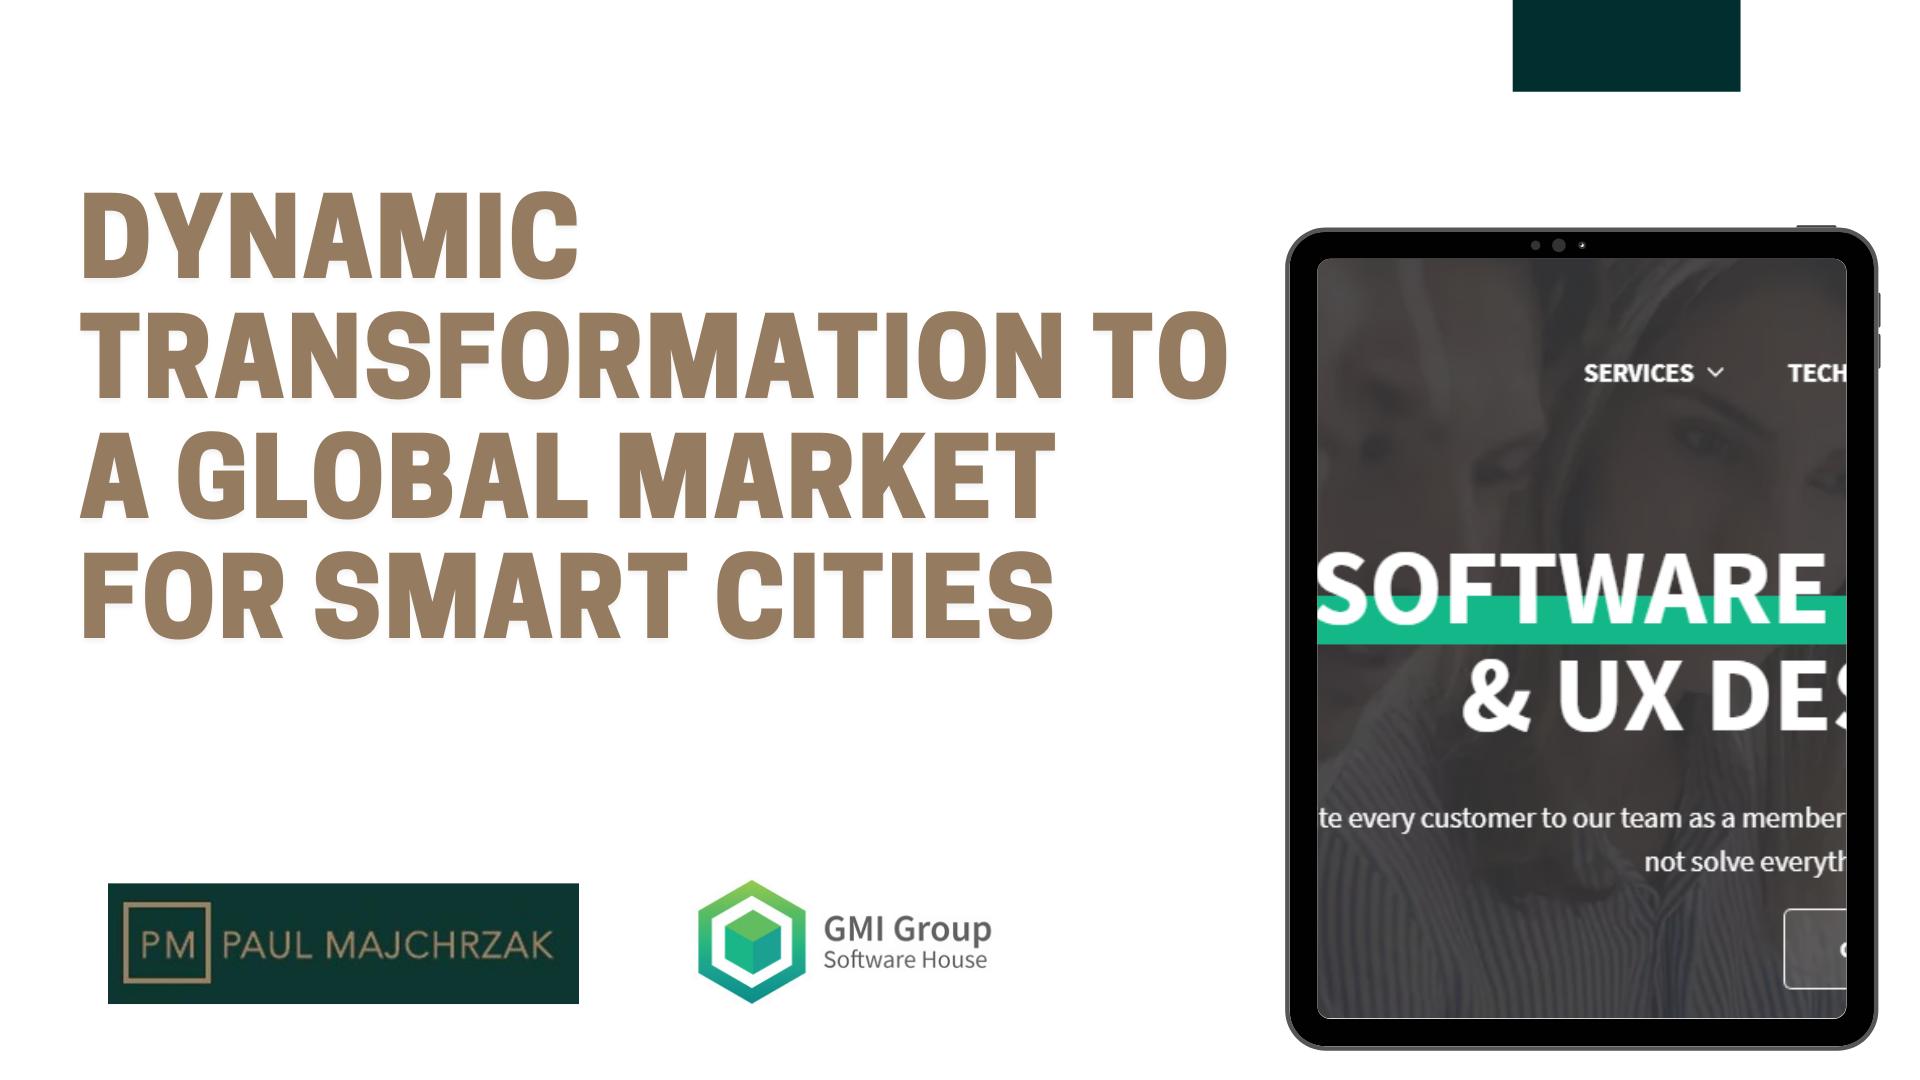 Dynamic transformation to a global smart city mark - Digital Strategy